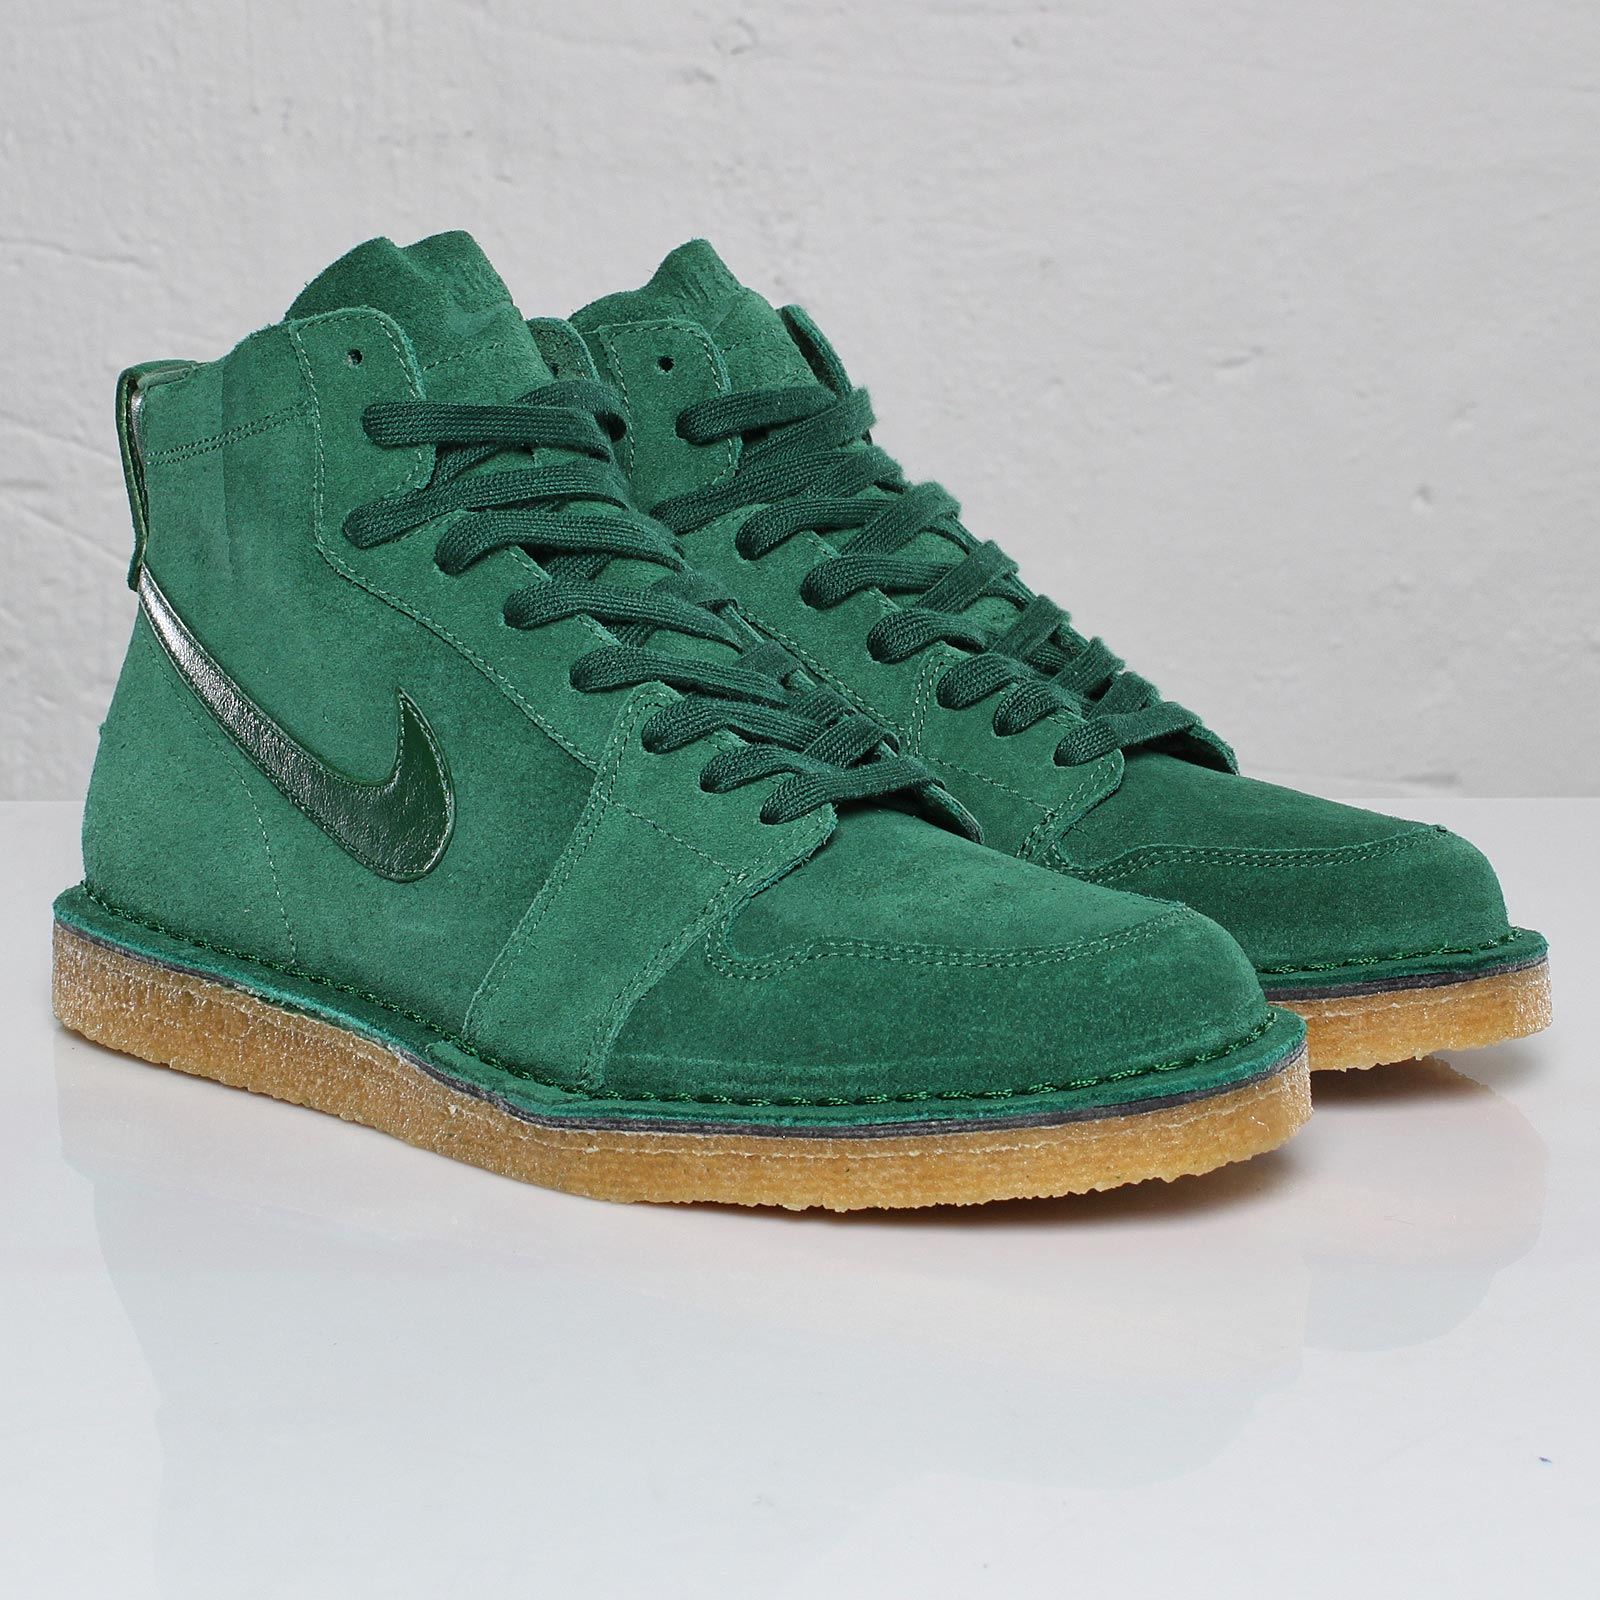 Nike Air Royal Mid SO TZ - 102422 - Sneakersnstuff  0c06bb830